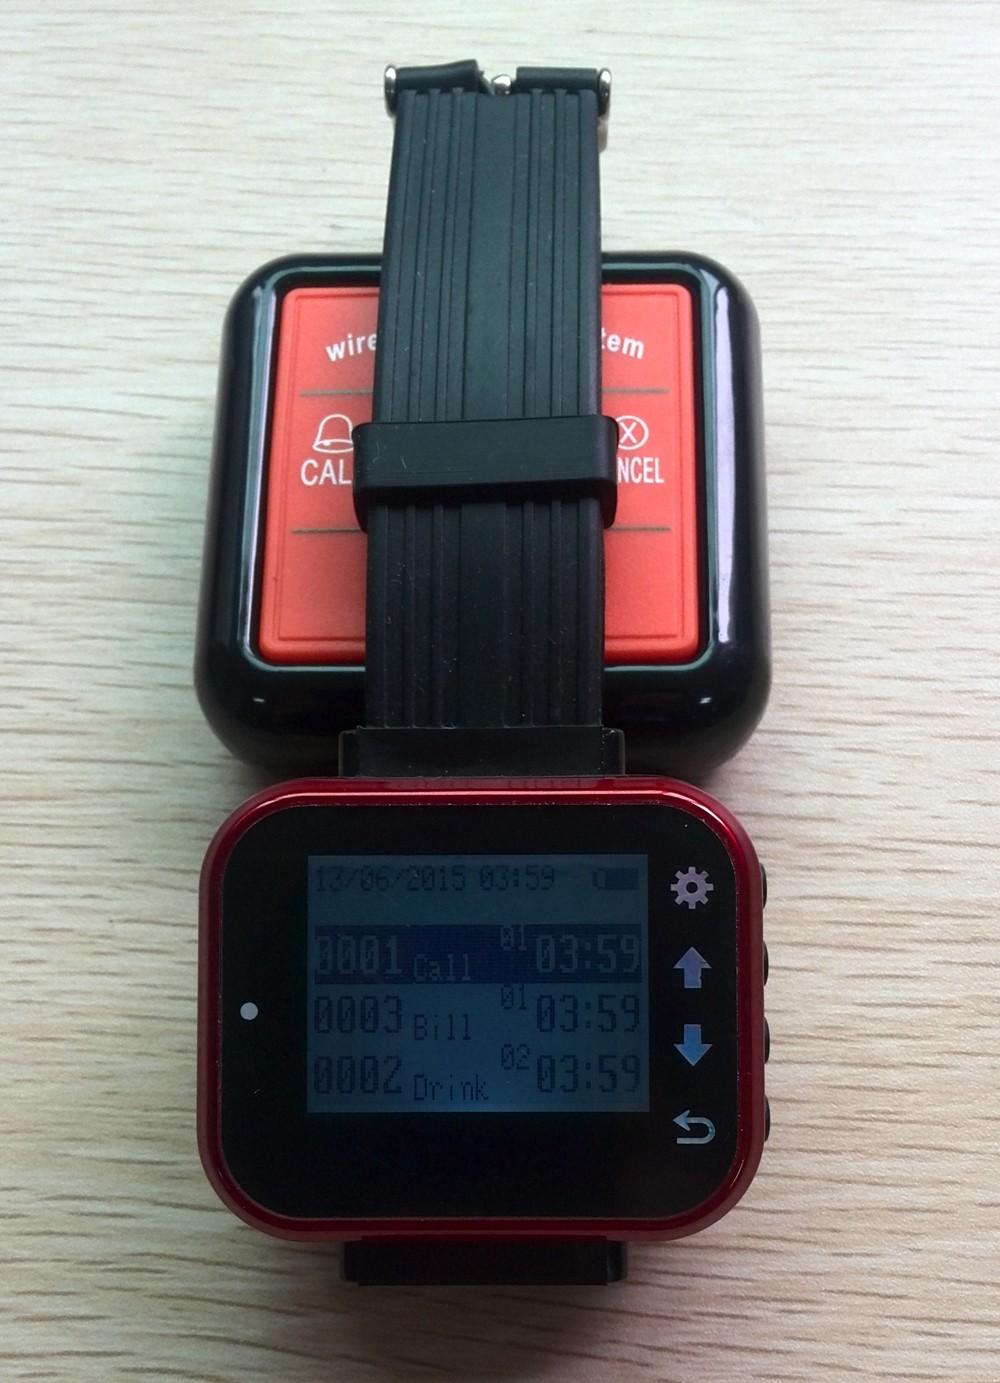 k-300plus red.3